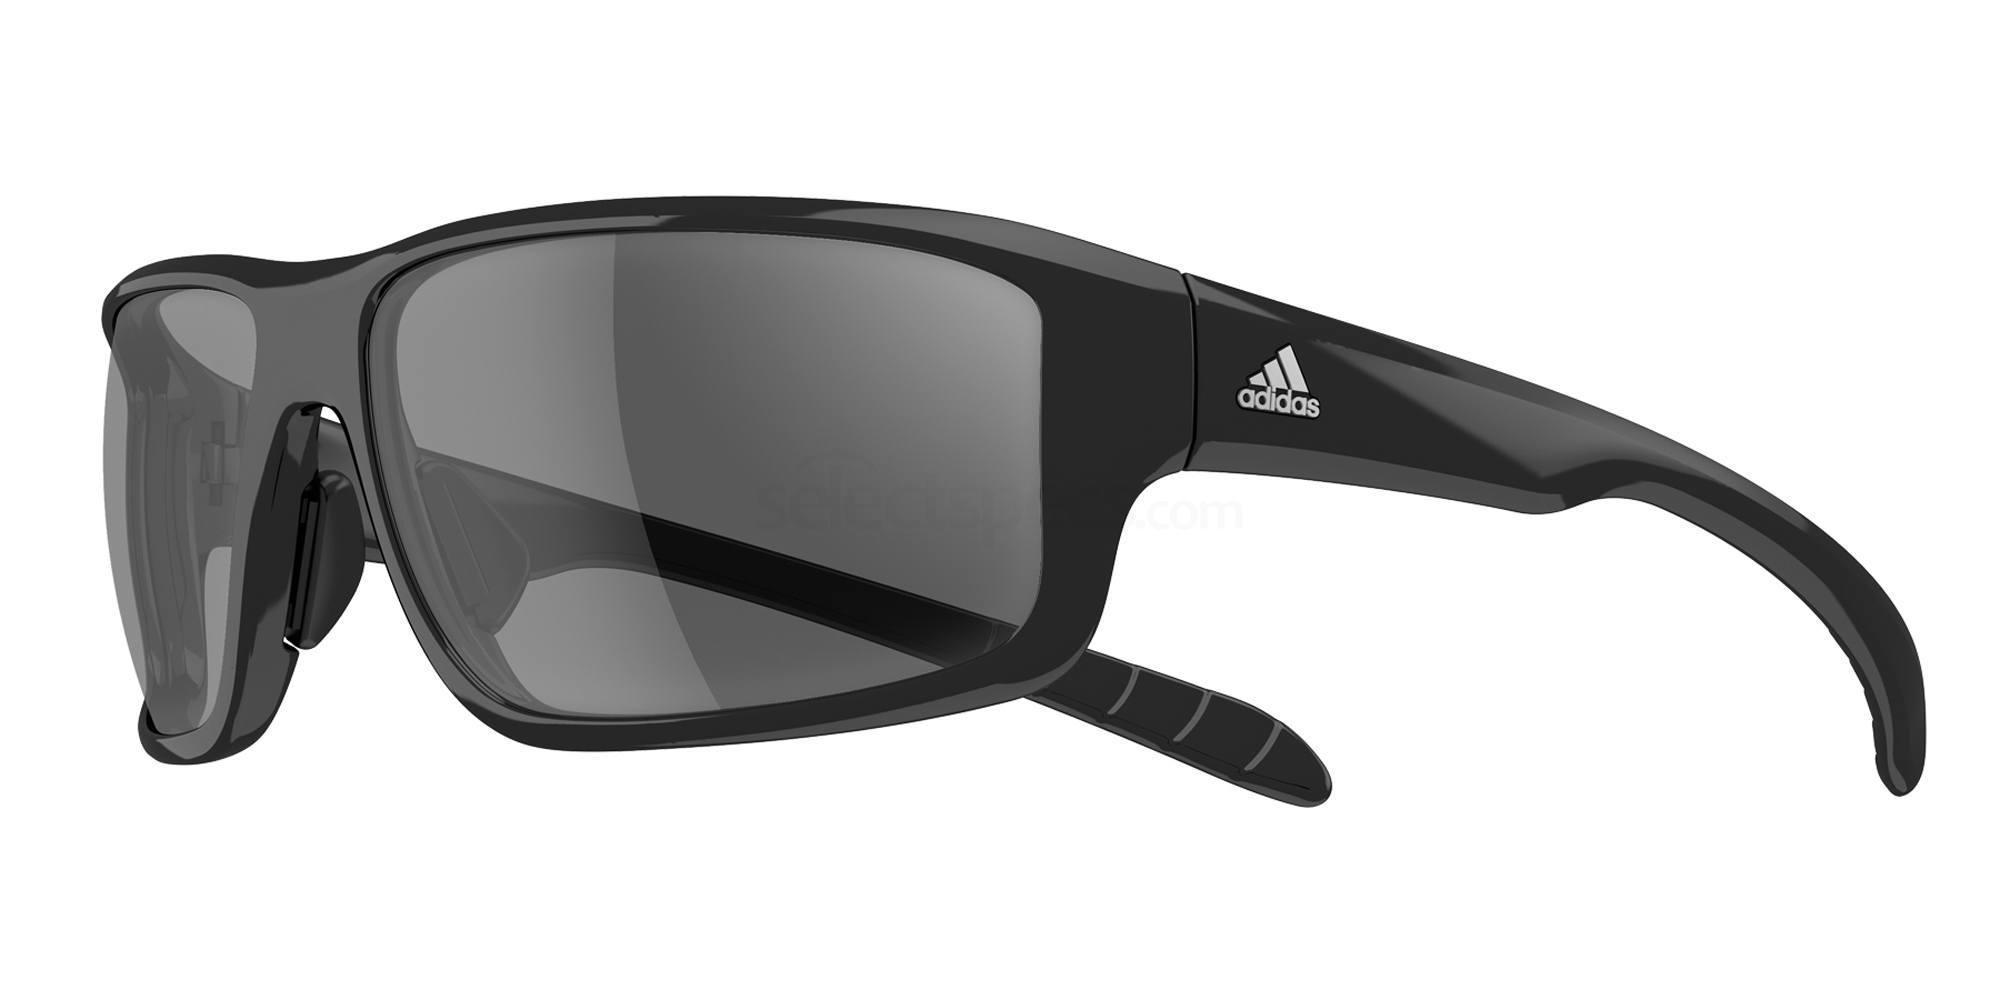 a424 00 6050 a424 kumacross 2.0 Sunglasses, Adidas